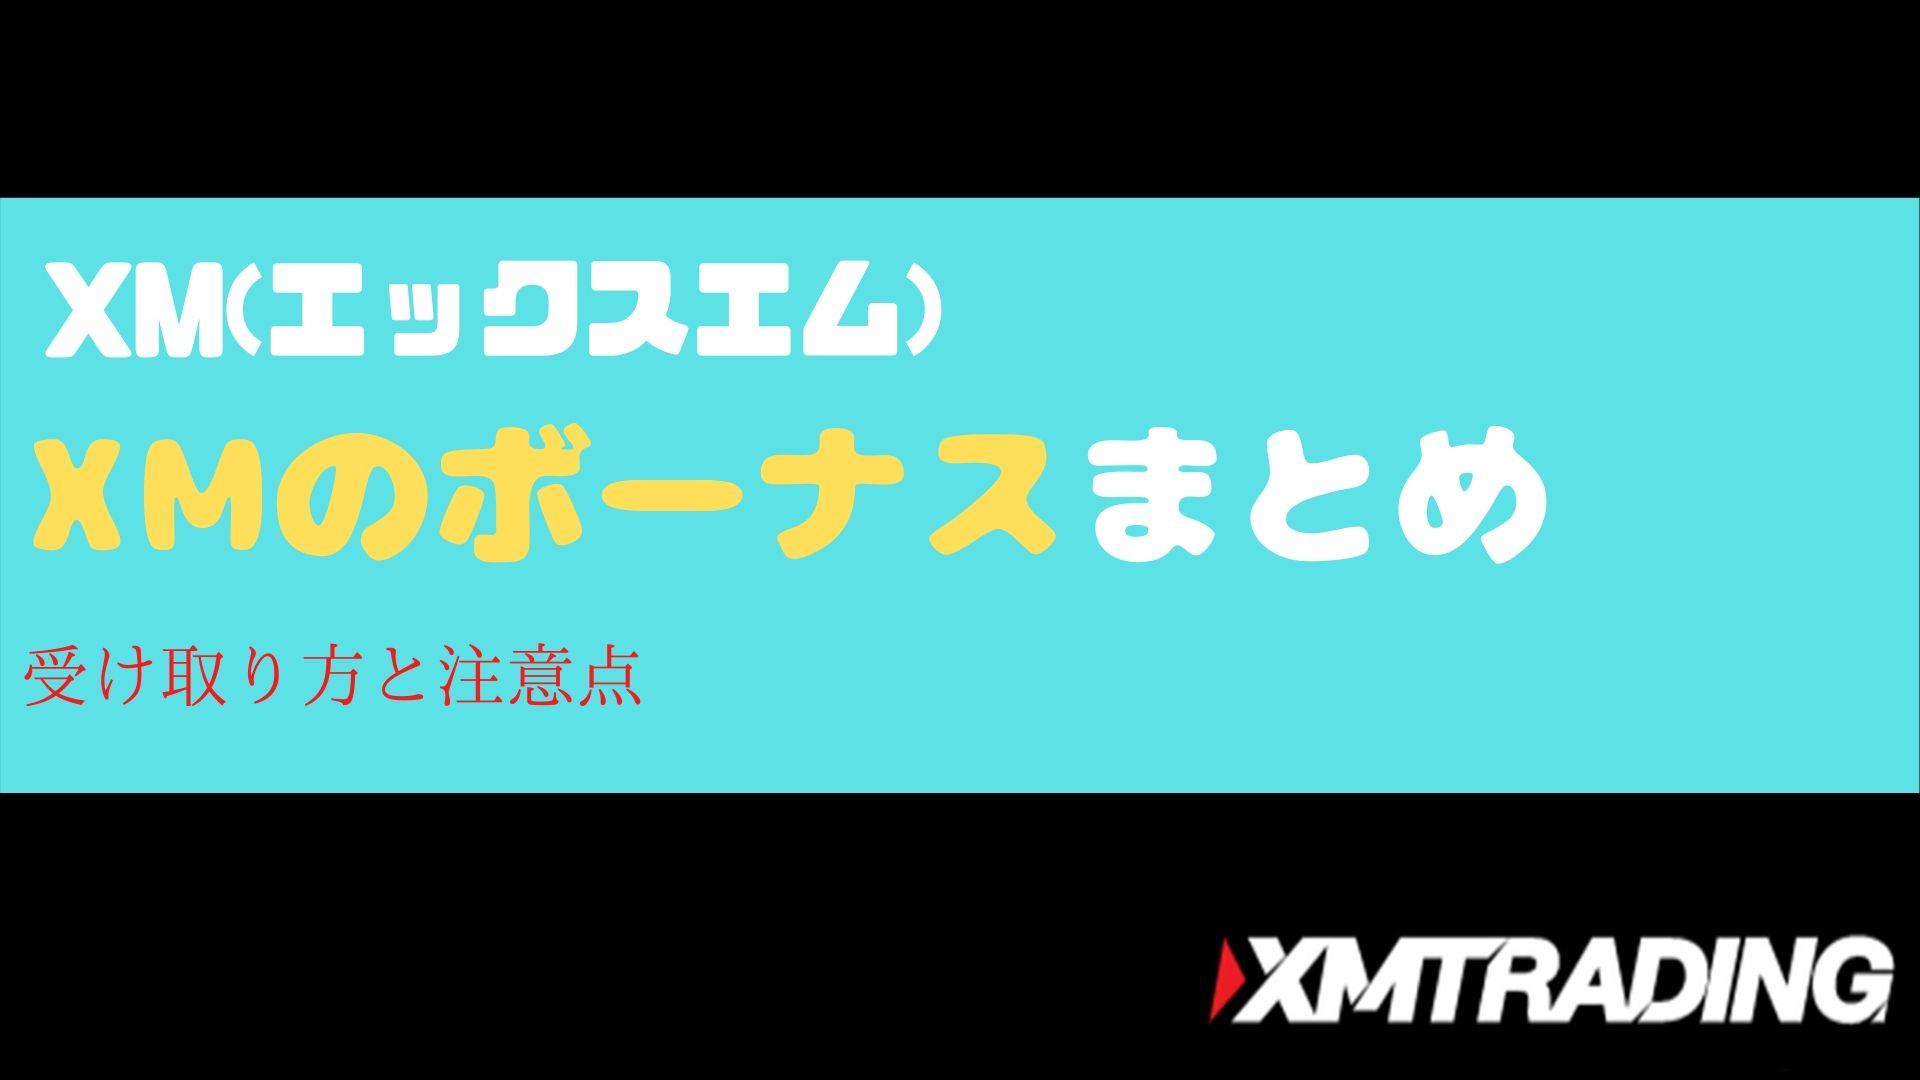 xm-demo-bonus-title